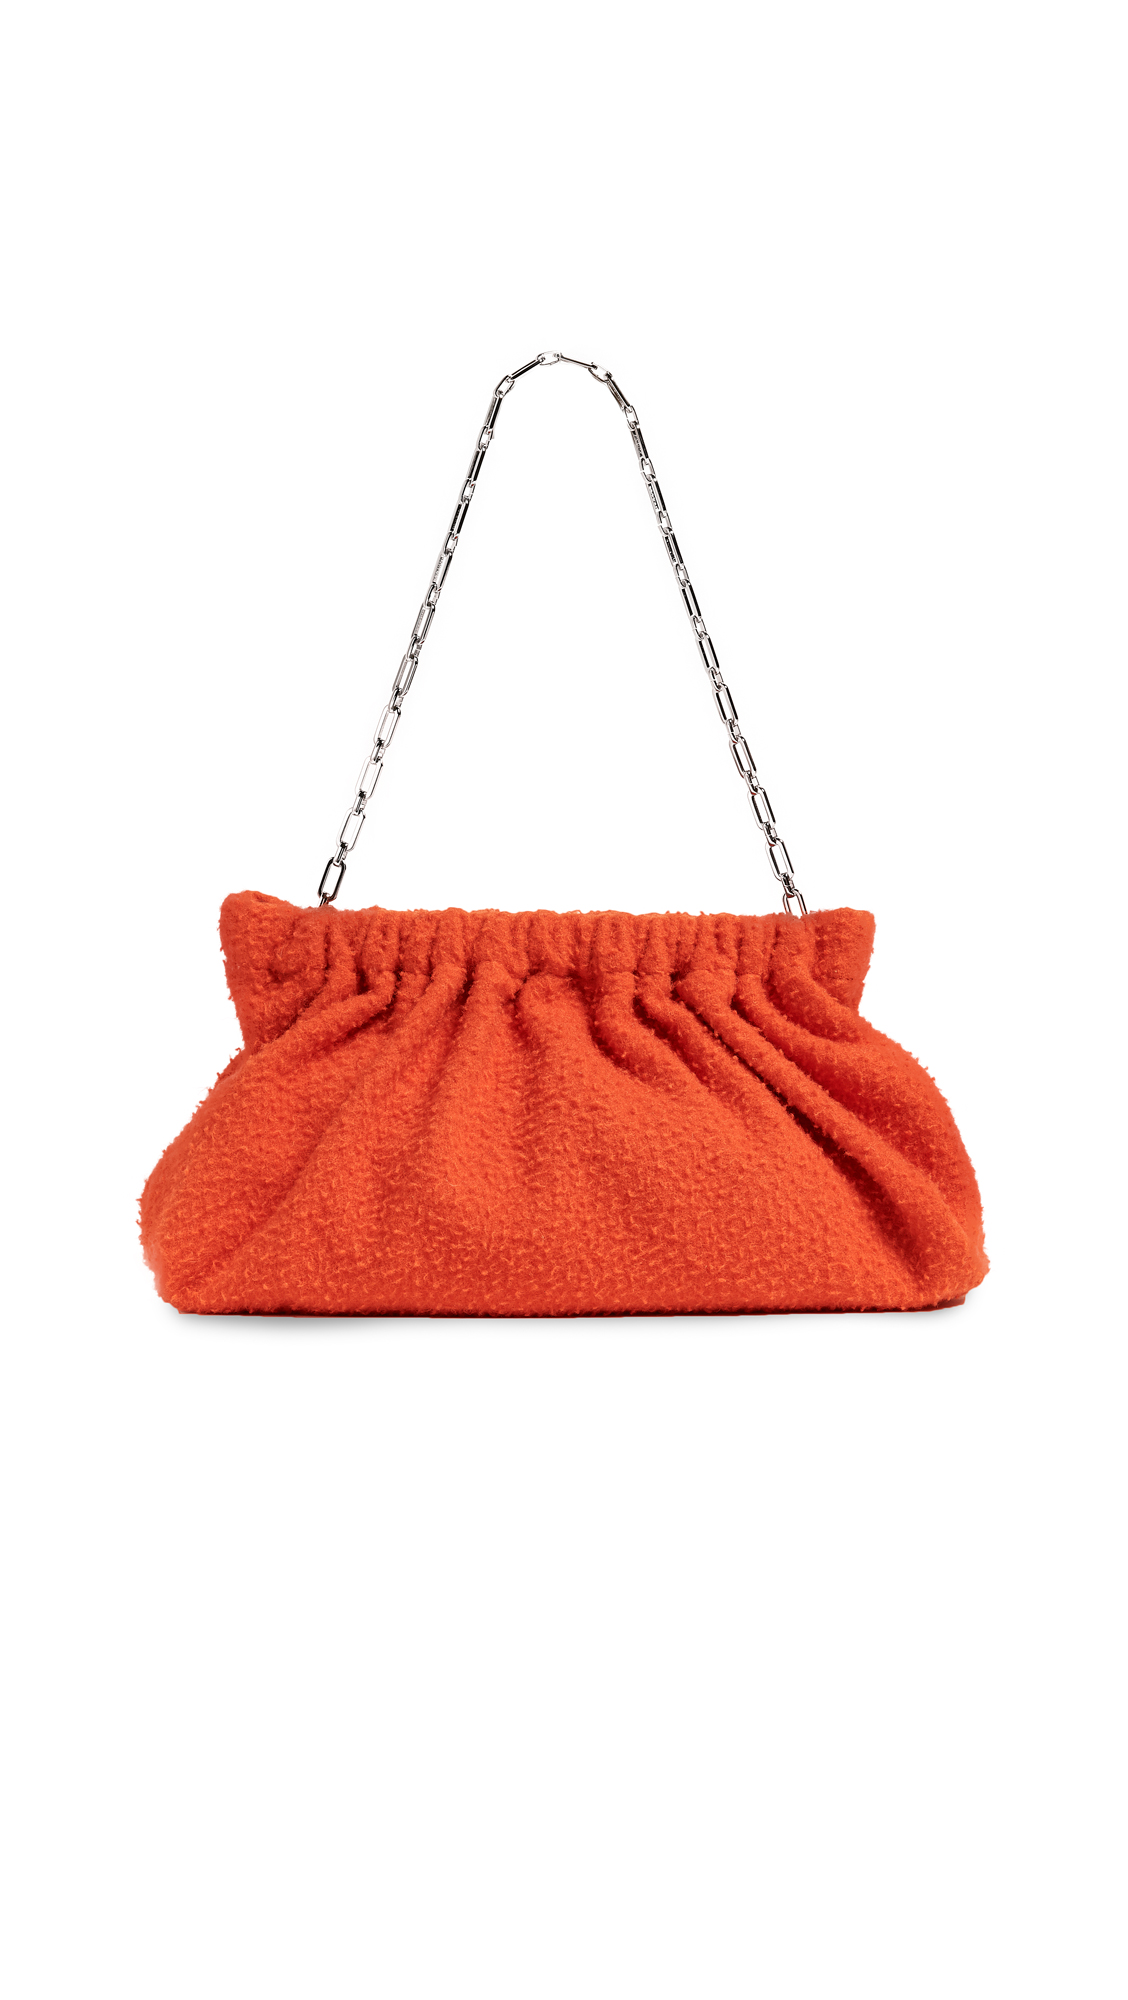 Rachel Comey Solon Bag - Persimmon